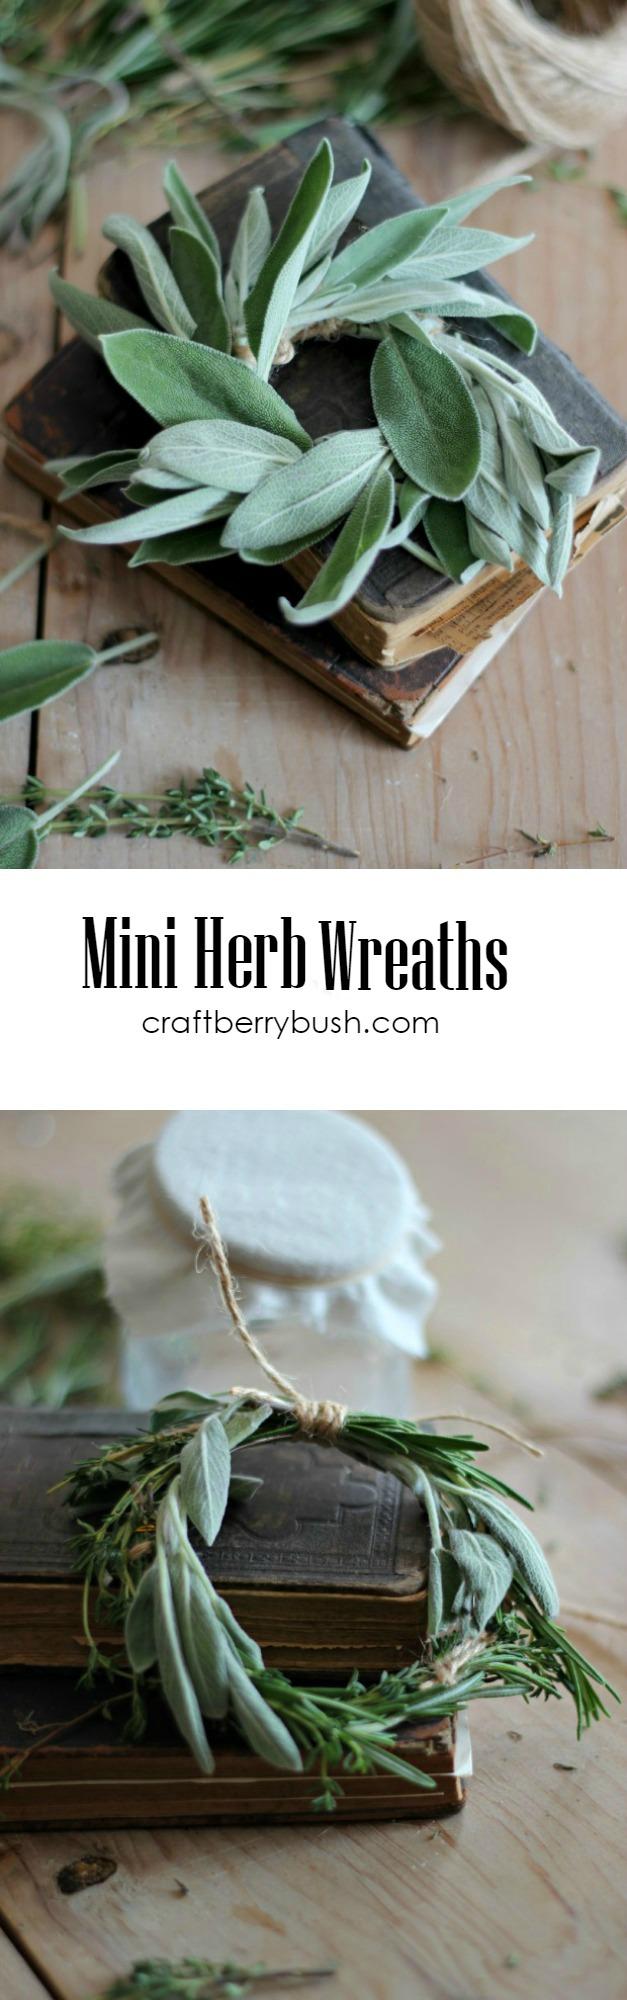 minihernwreath